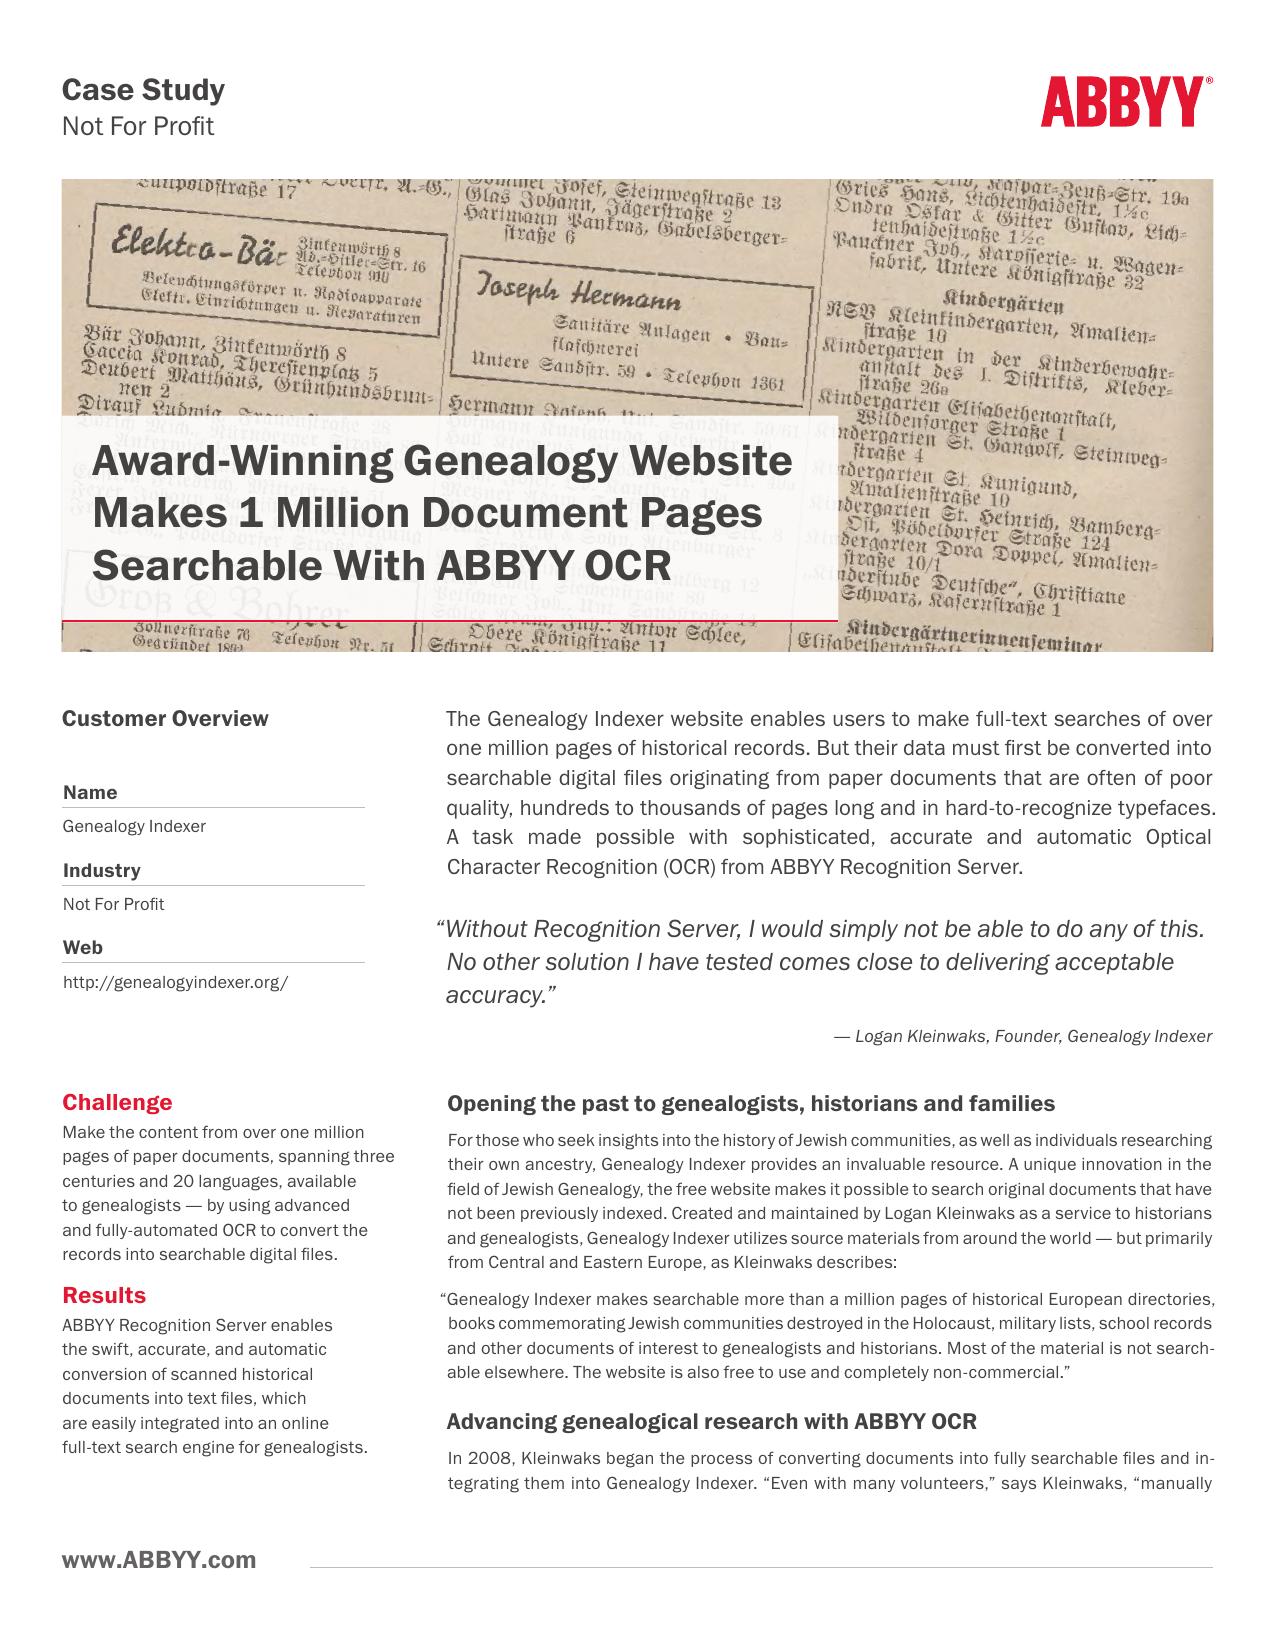 Award-Winning Genealogy Website Makes 1 Million | manualzz com